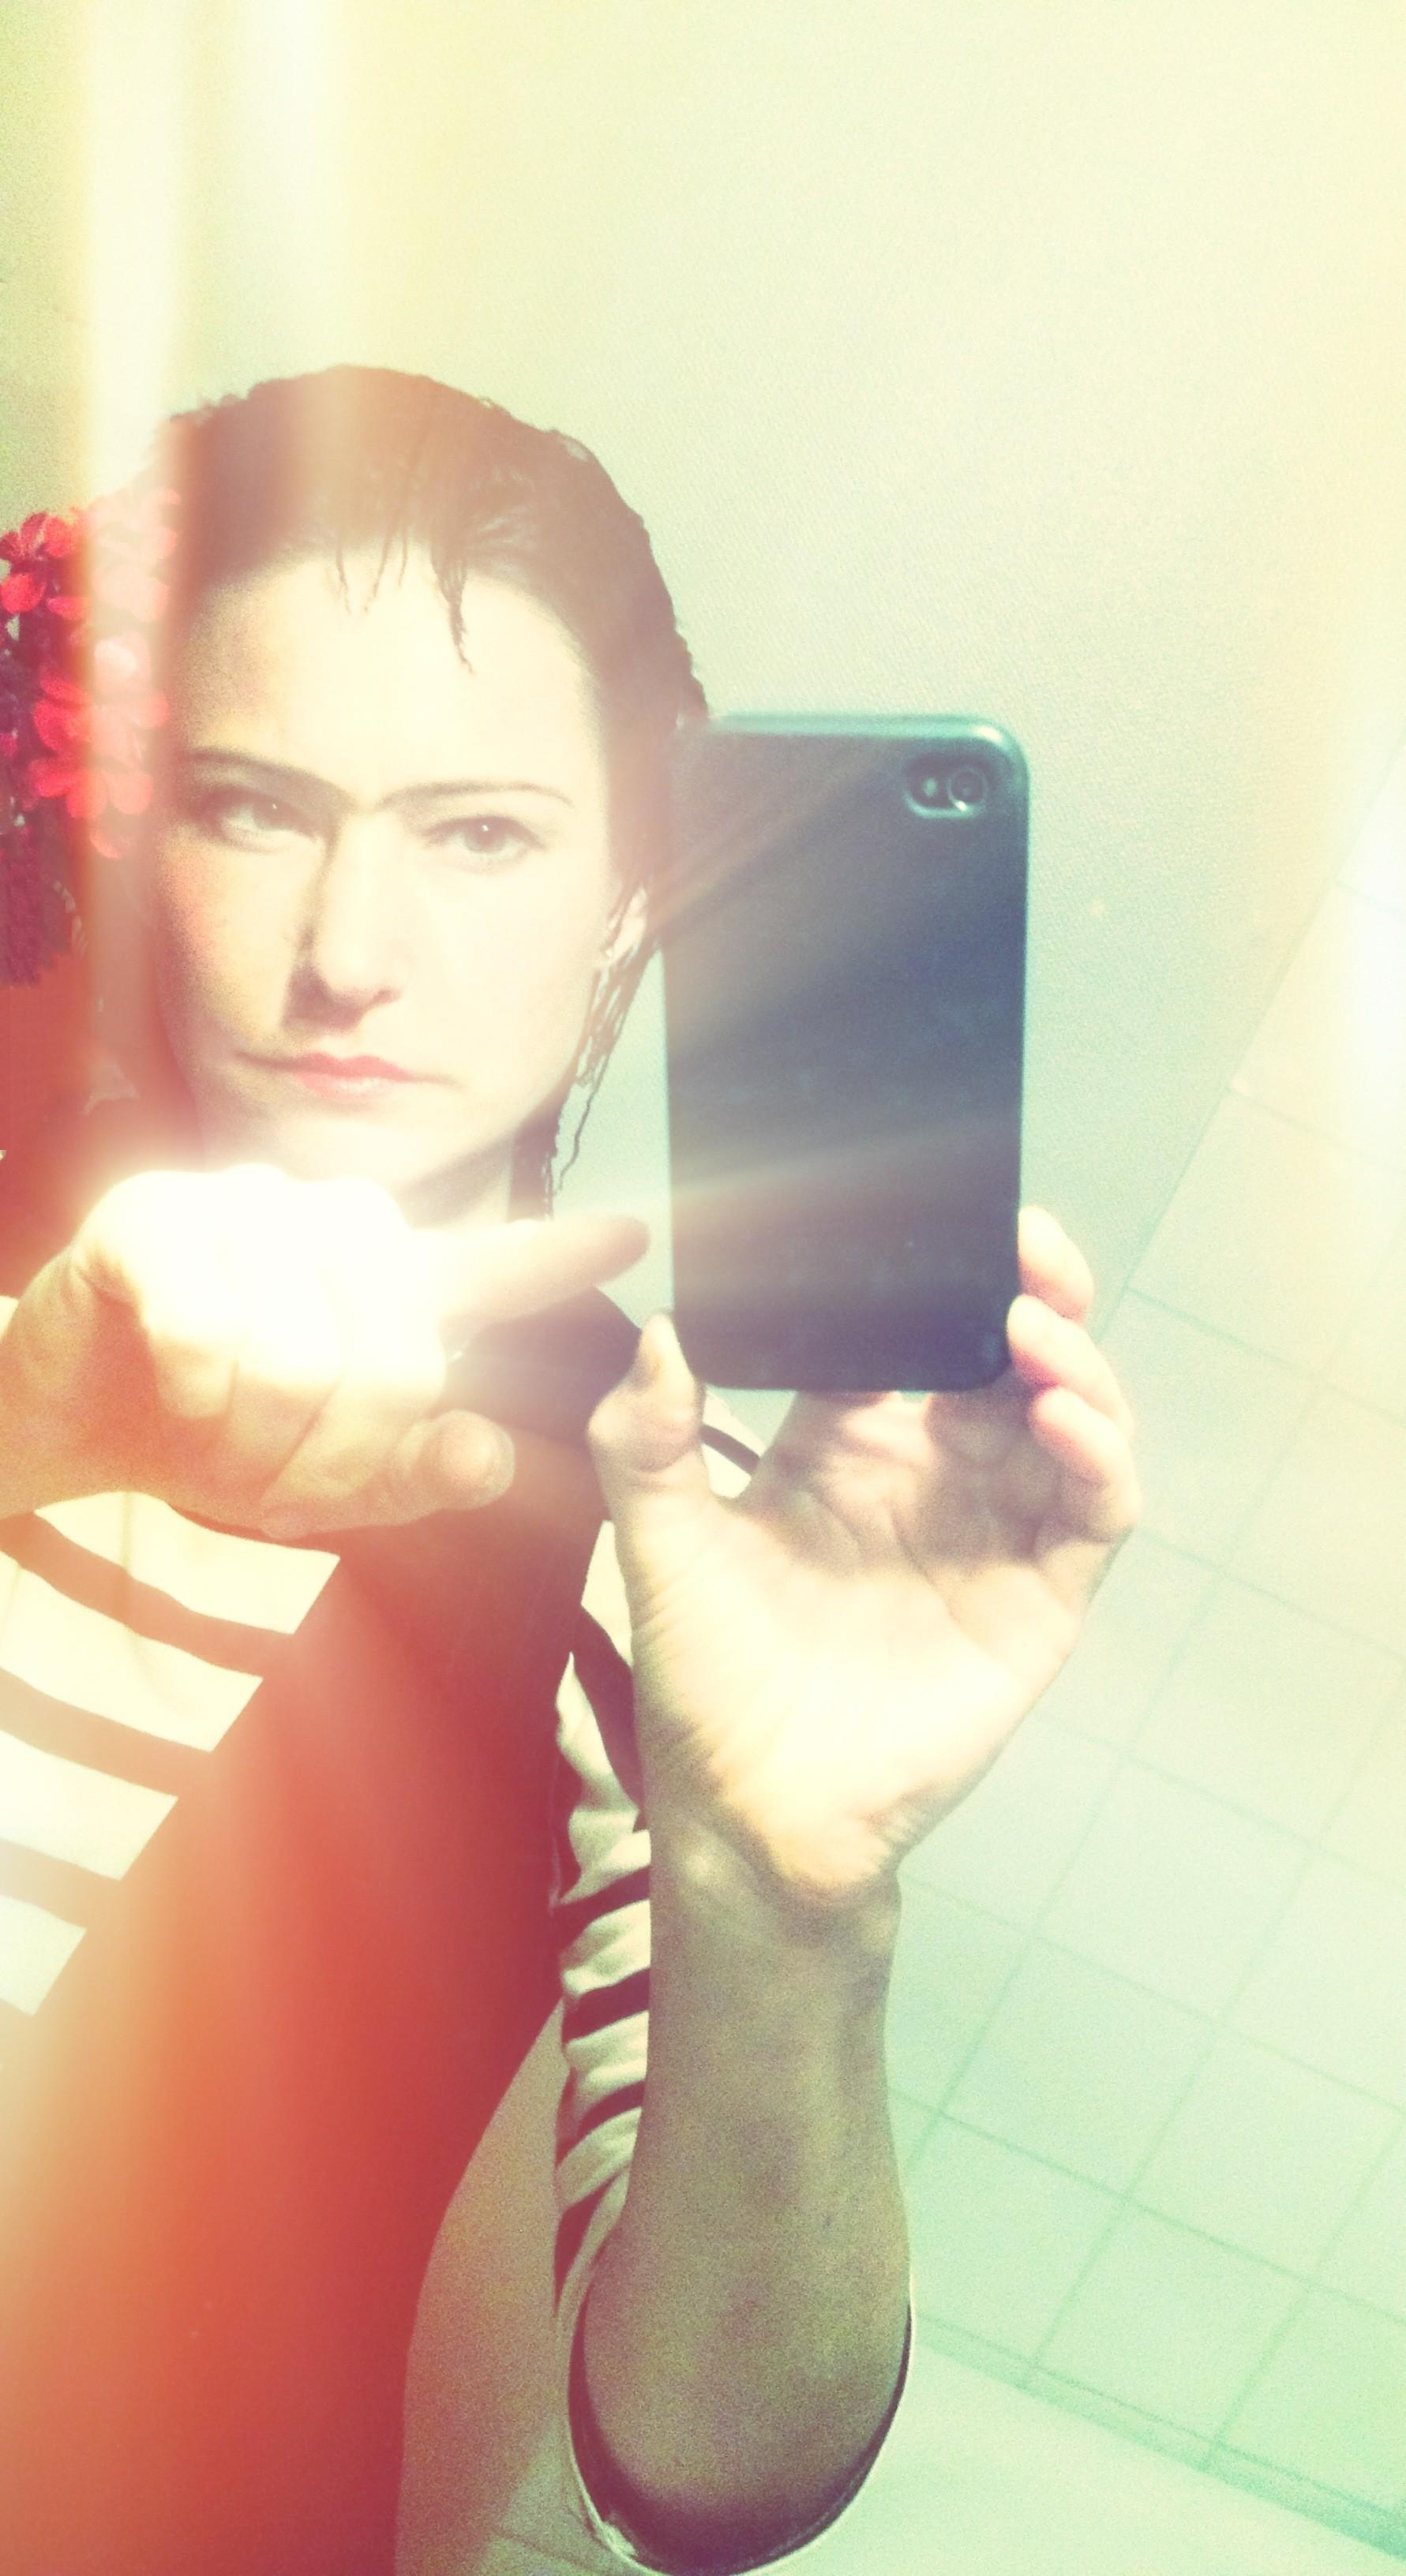 Creative iPhoneographer and artist Anne Vilemsons